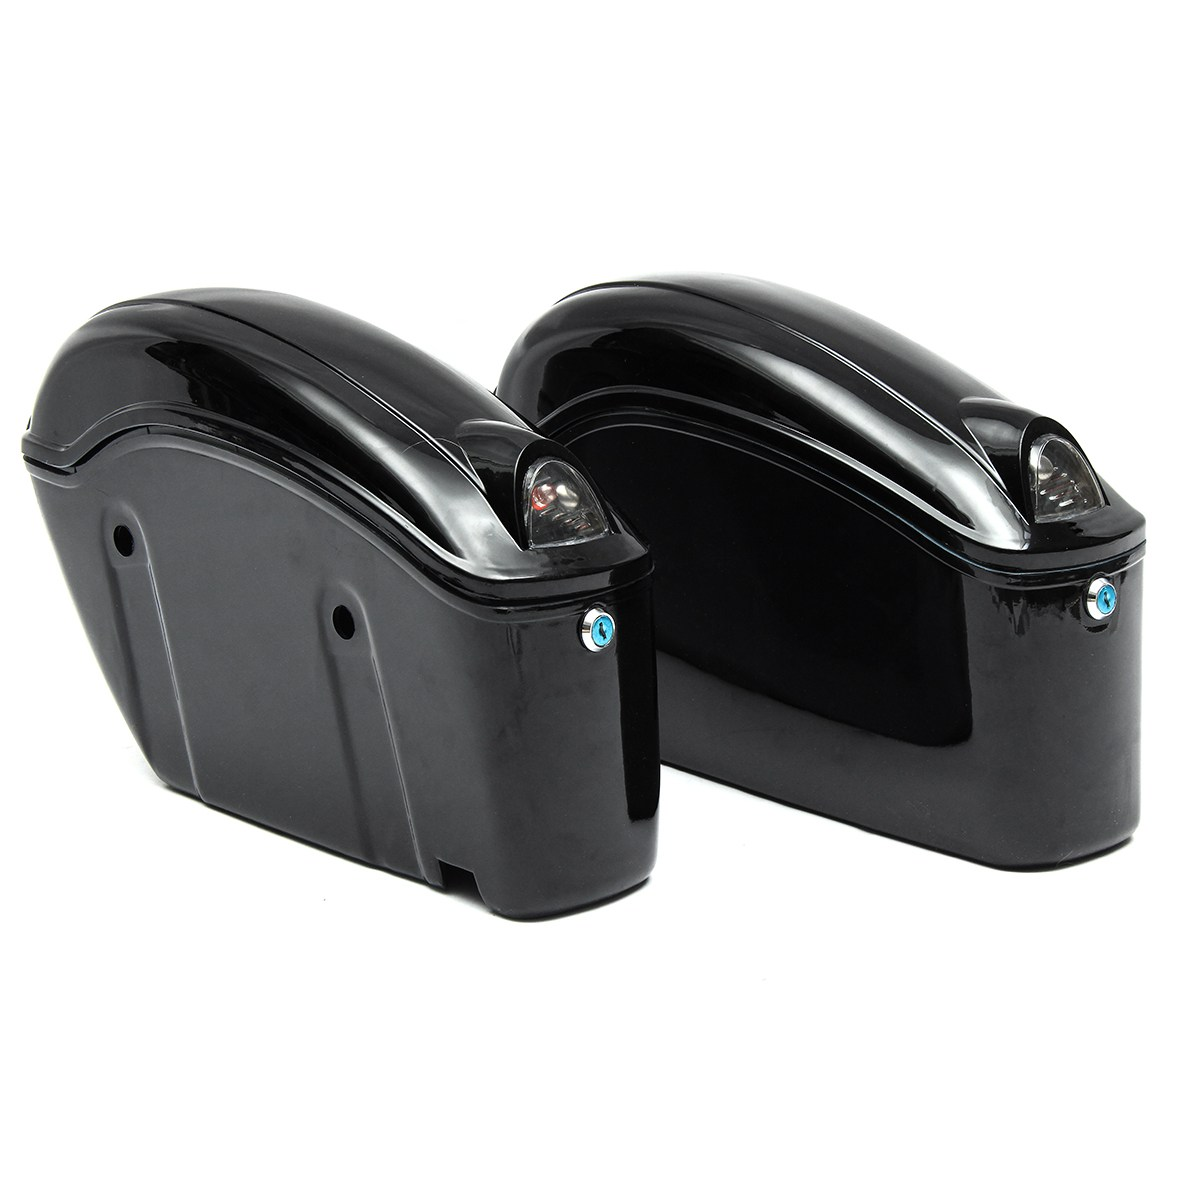 1 Pair Motorcycle Saddle Bags Retro Waterproof Motorbike Tail Rear Bags Large Capacity Tool Bag For Harley-Davidson